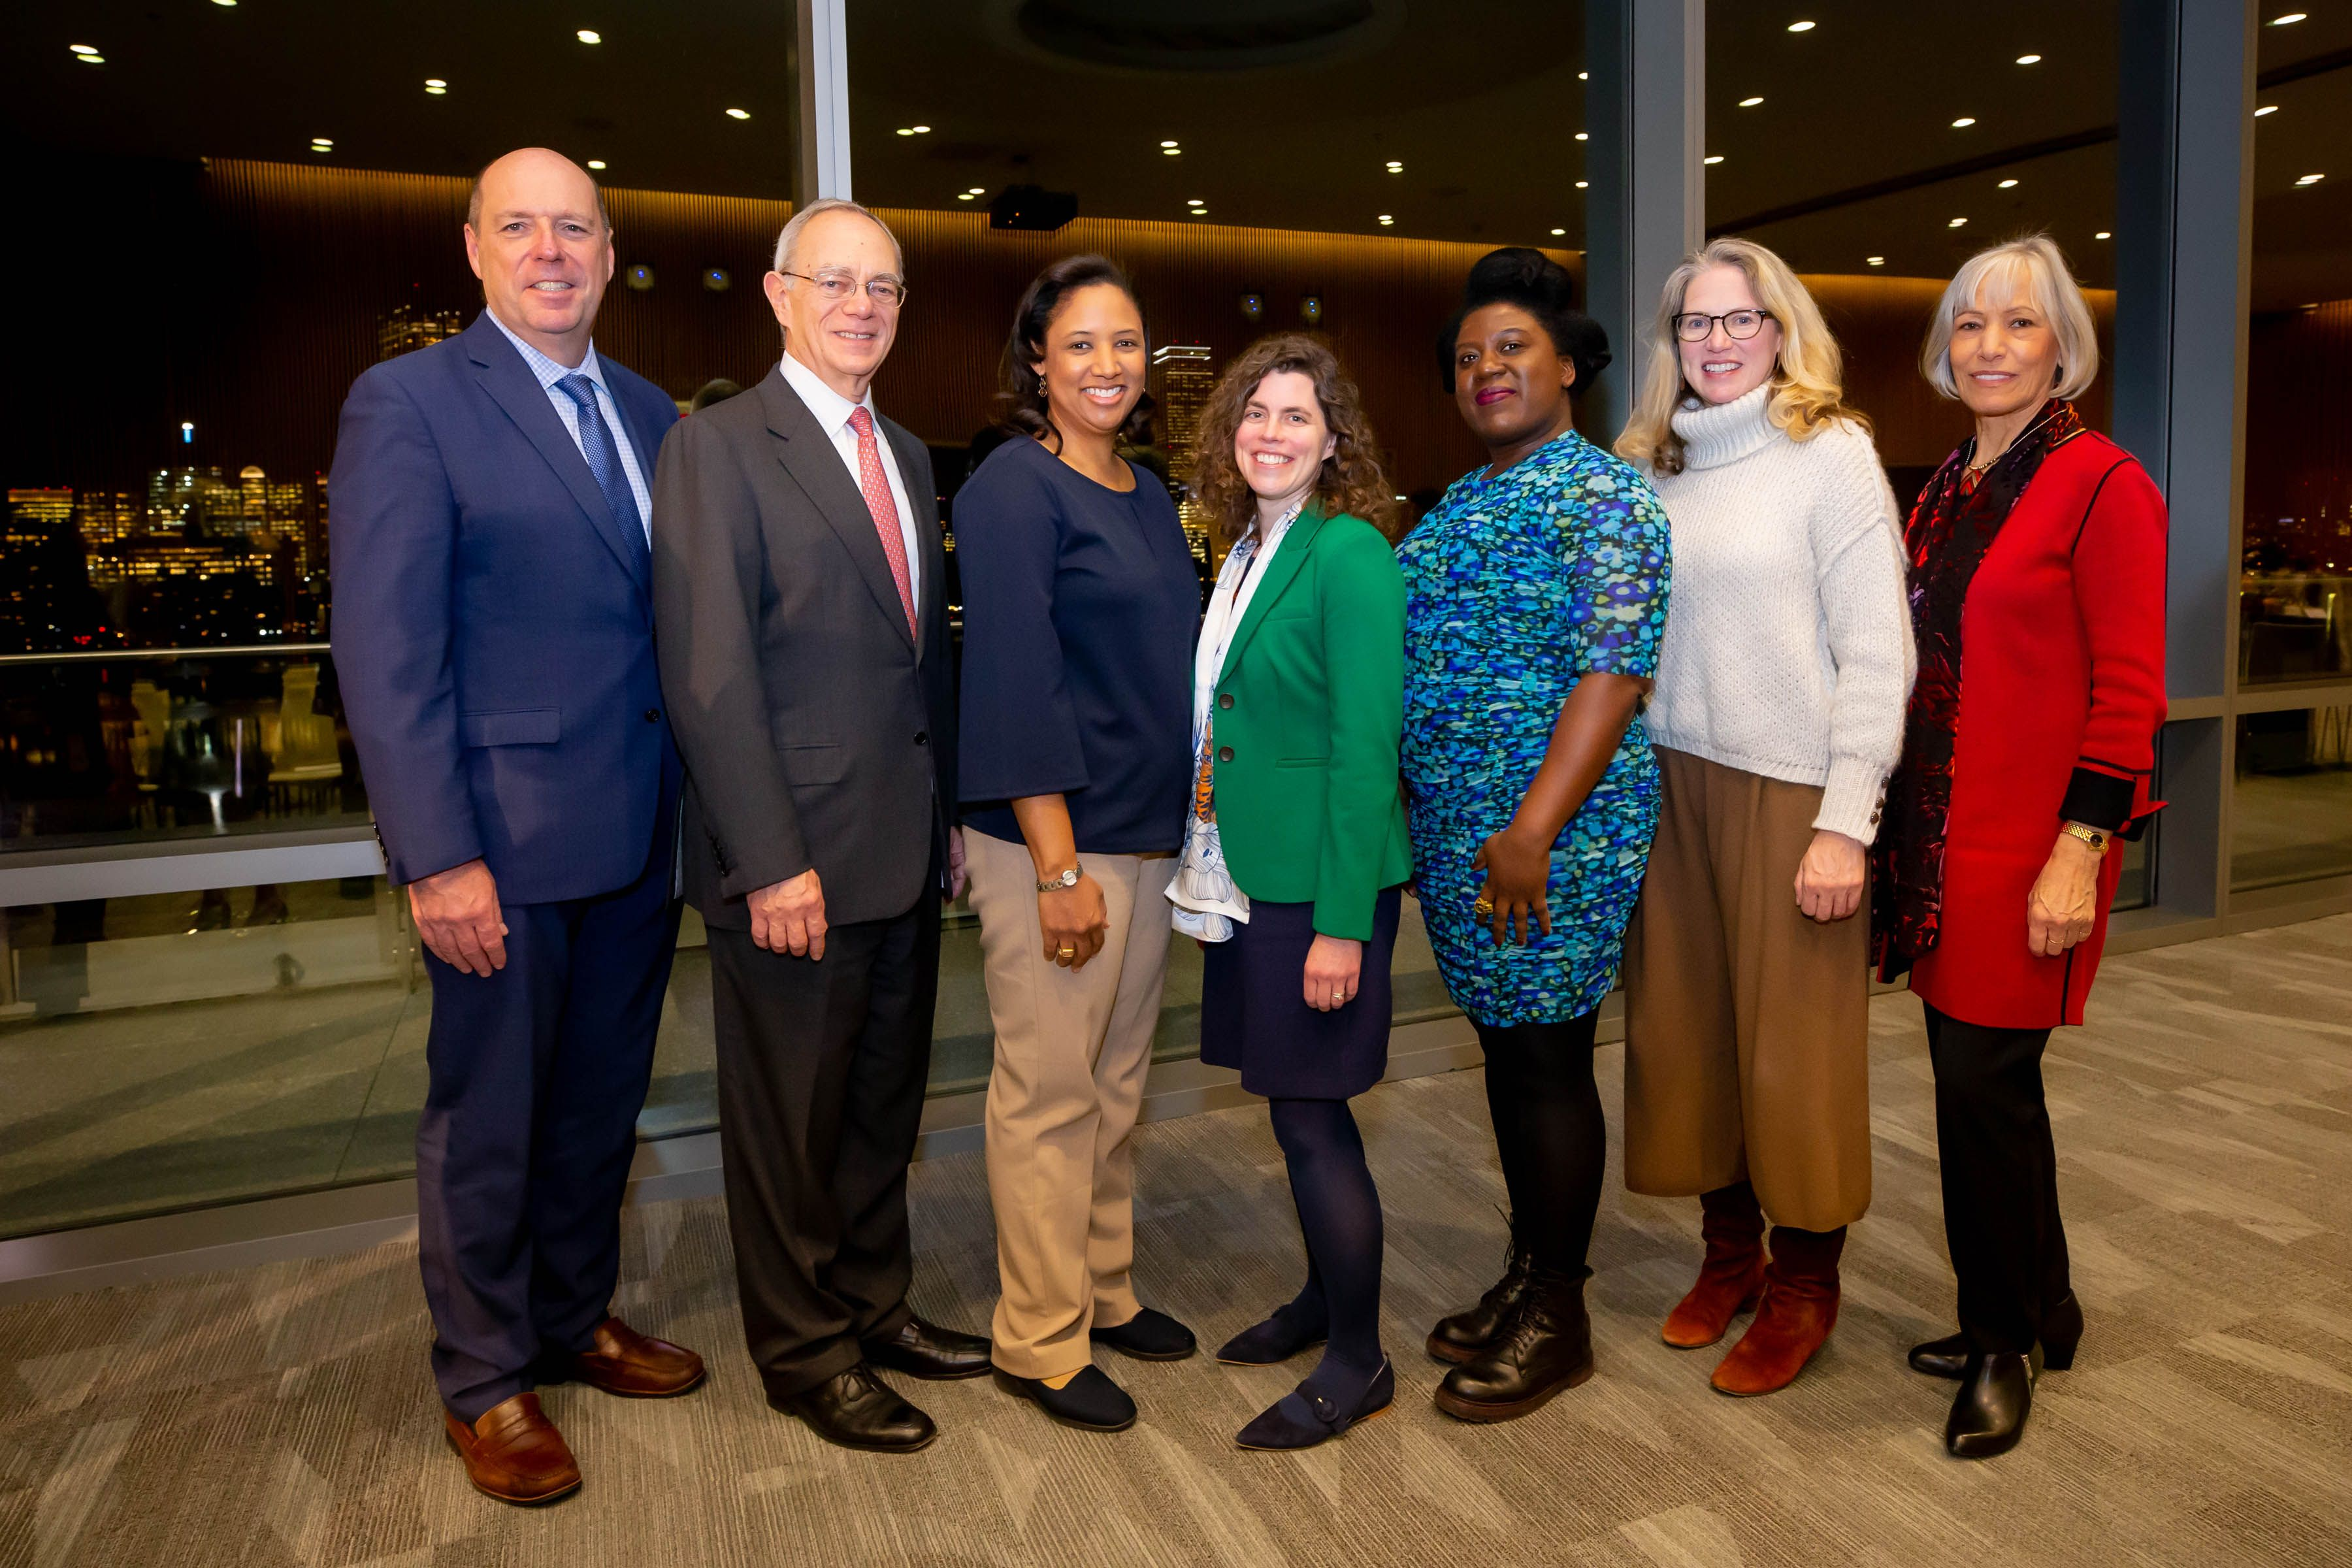 Bose grants for 2019 reward bold ideas across disciplines